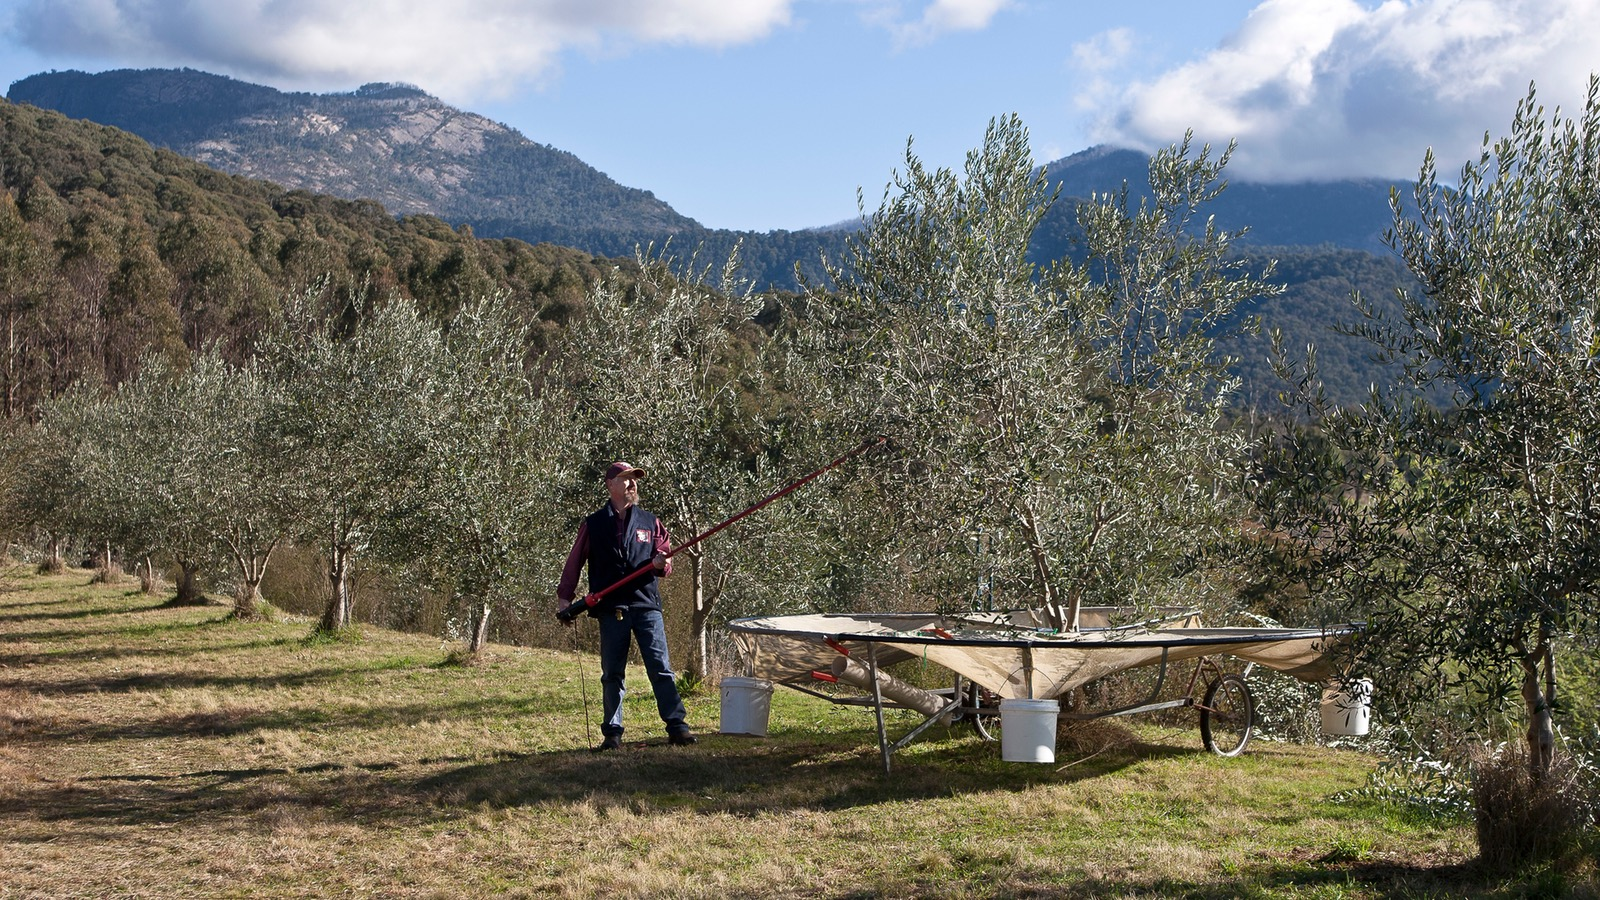 Harvesting the olives at Mt Buffalo Olives